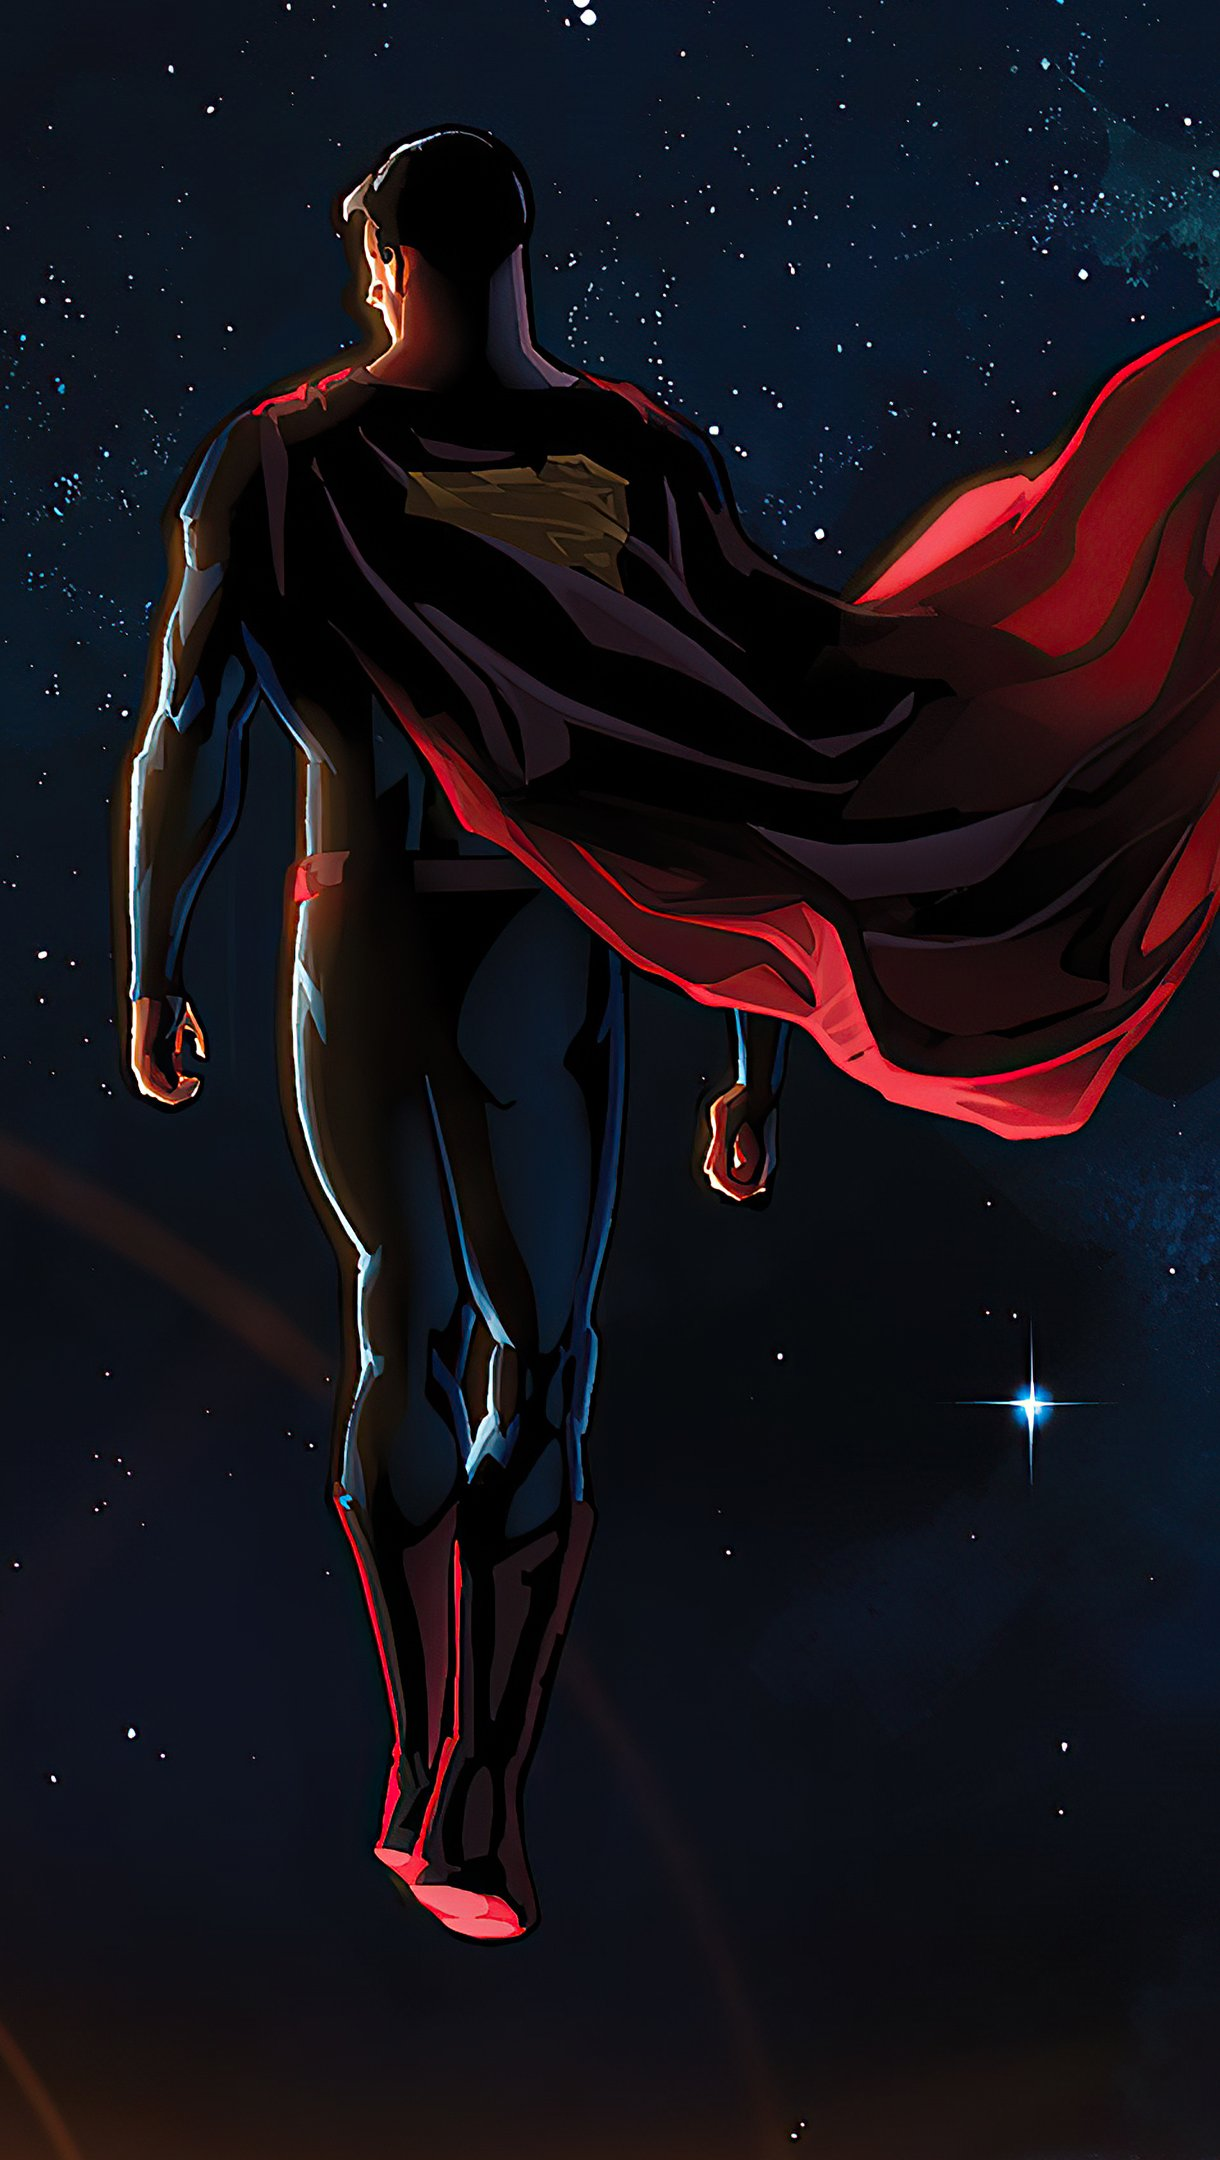 Wallpaper Superman in space Fanart Vertical